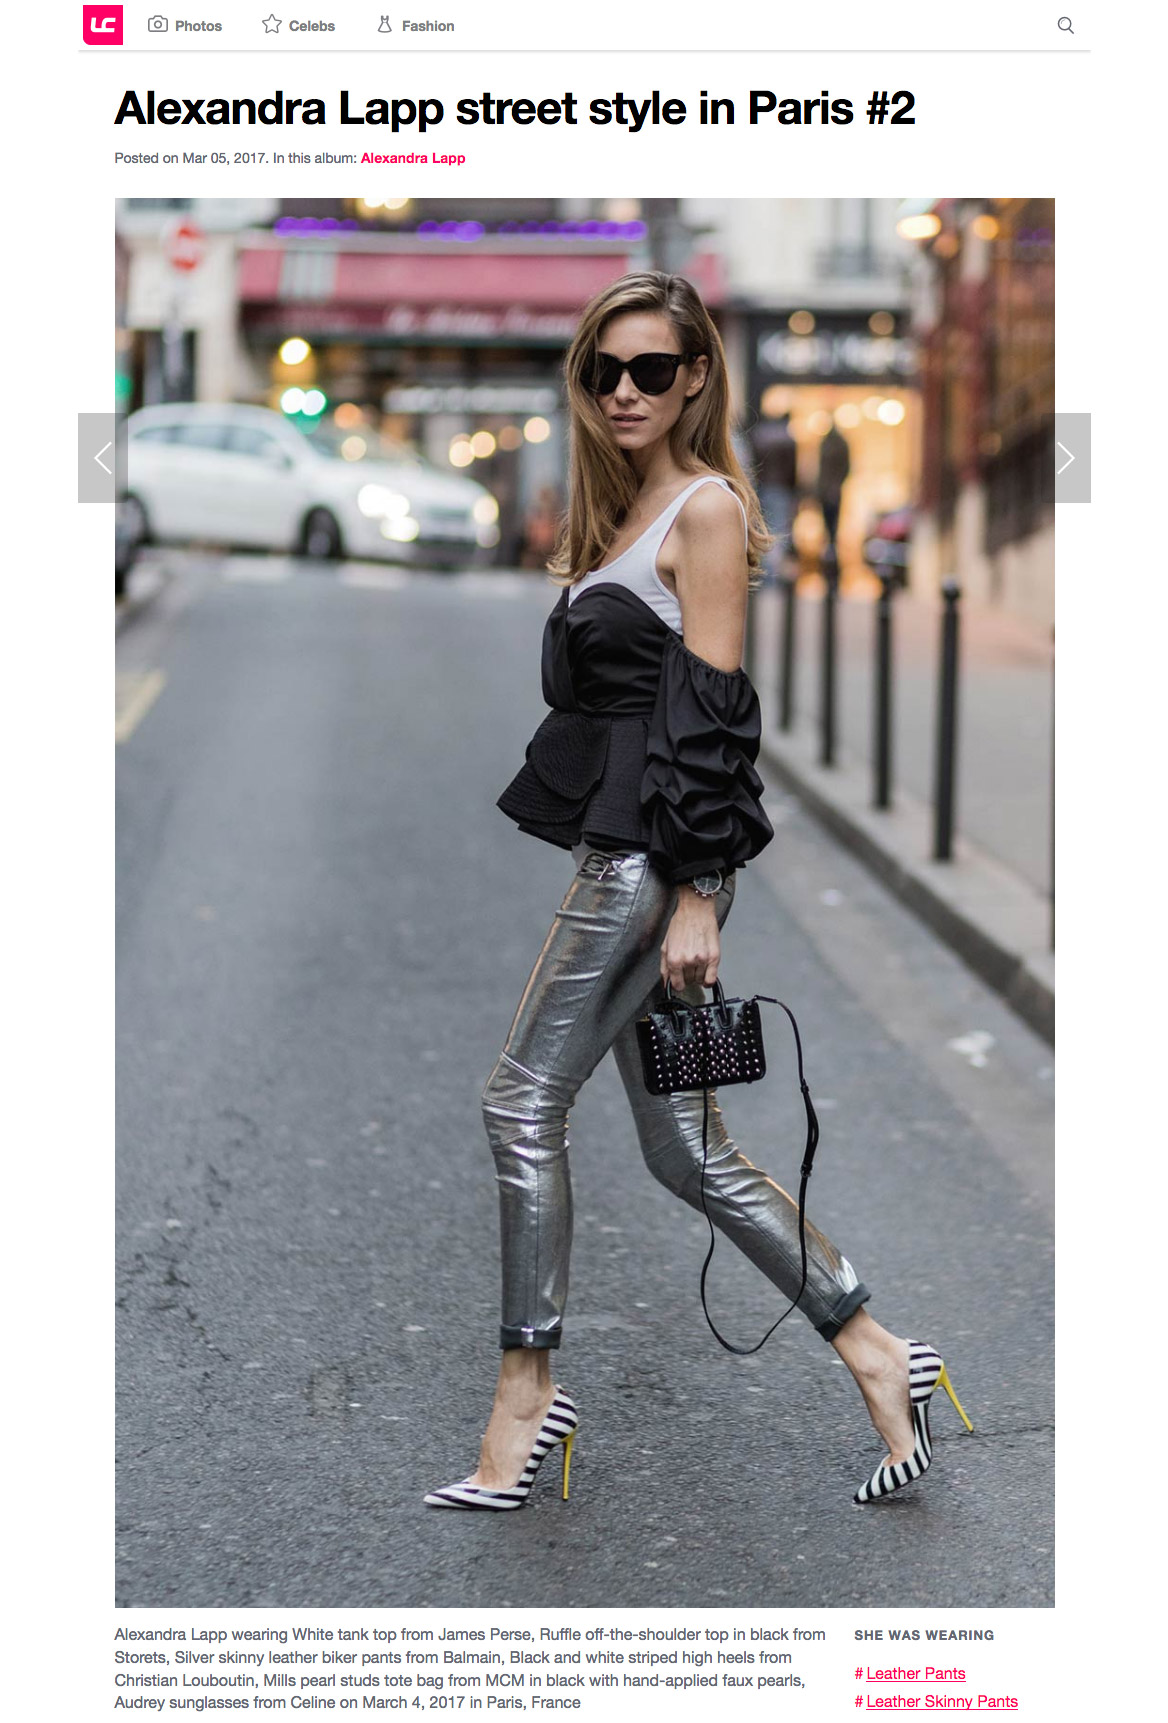 Alexandra Lapp street style in Paris 2 - Leather Celebrities - 2017 03 - found on http://www.leathercelebrities.com/photos/entry/alexandra-lapp-street-style-in-paris-2/